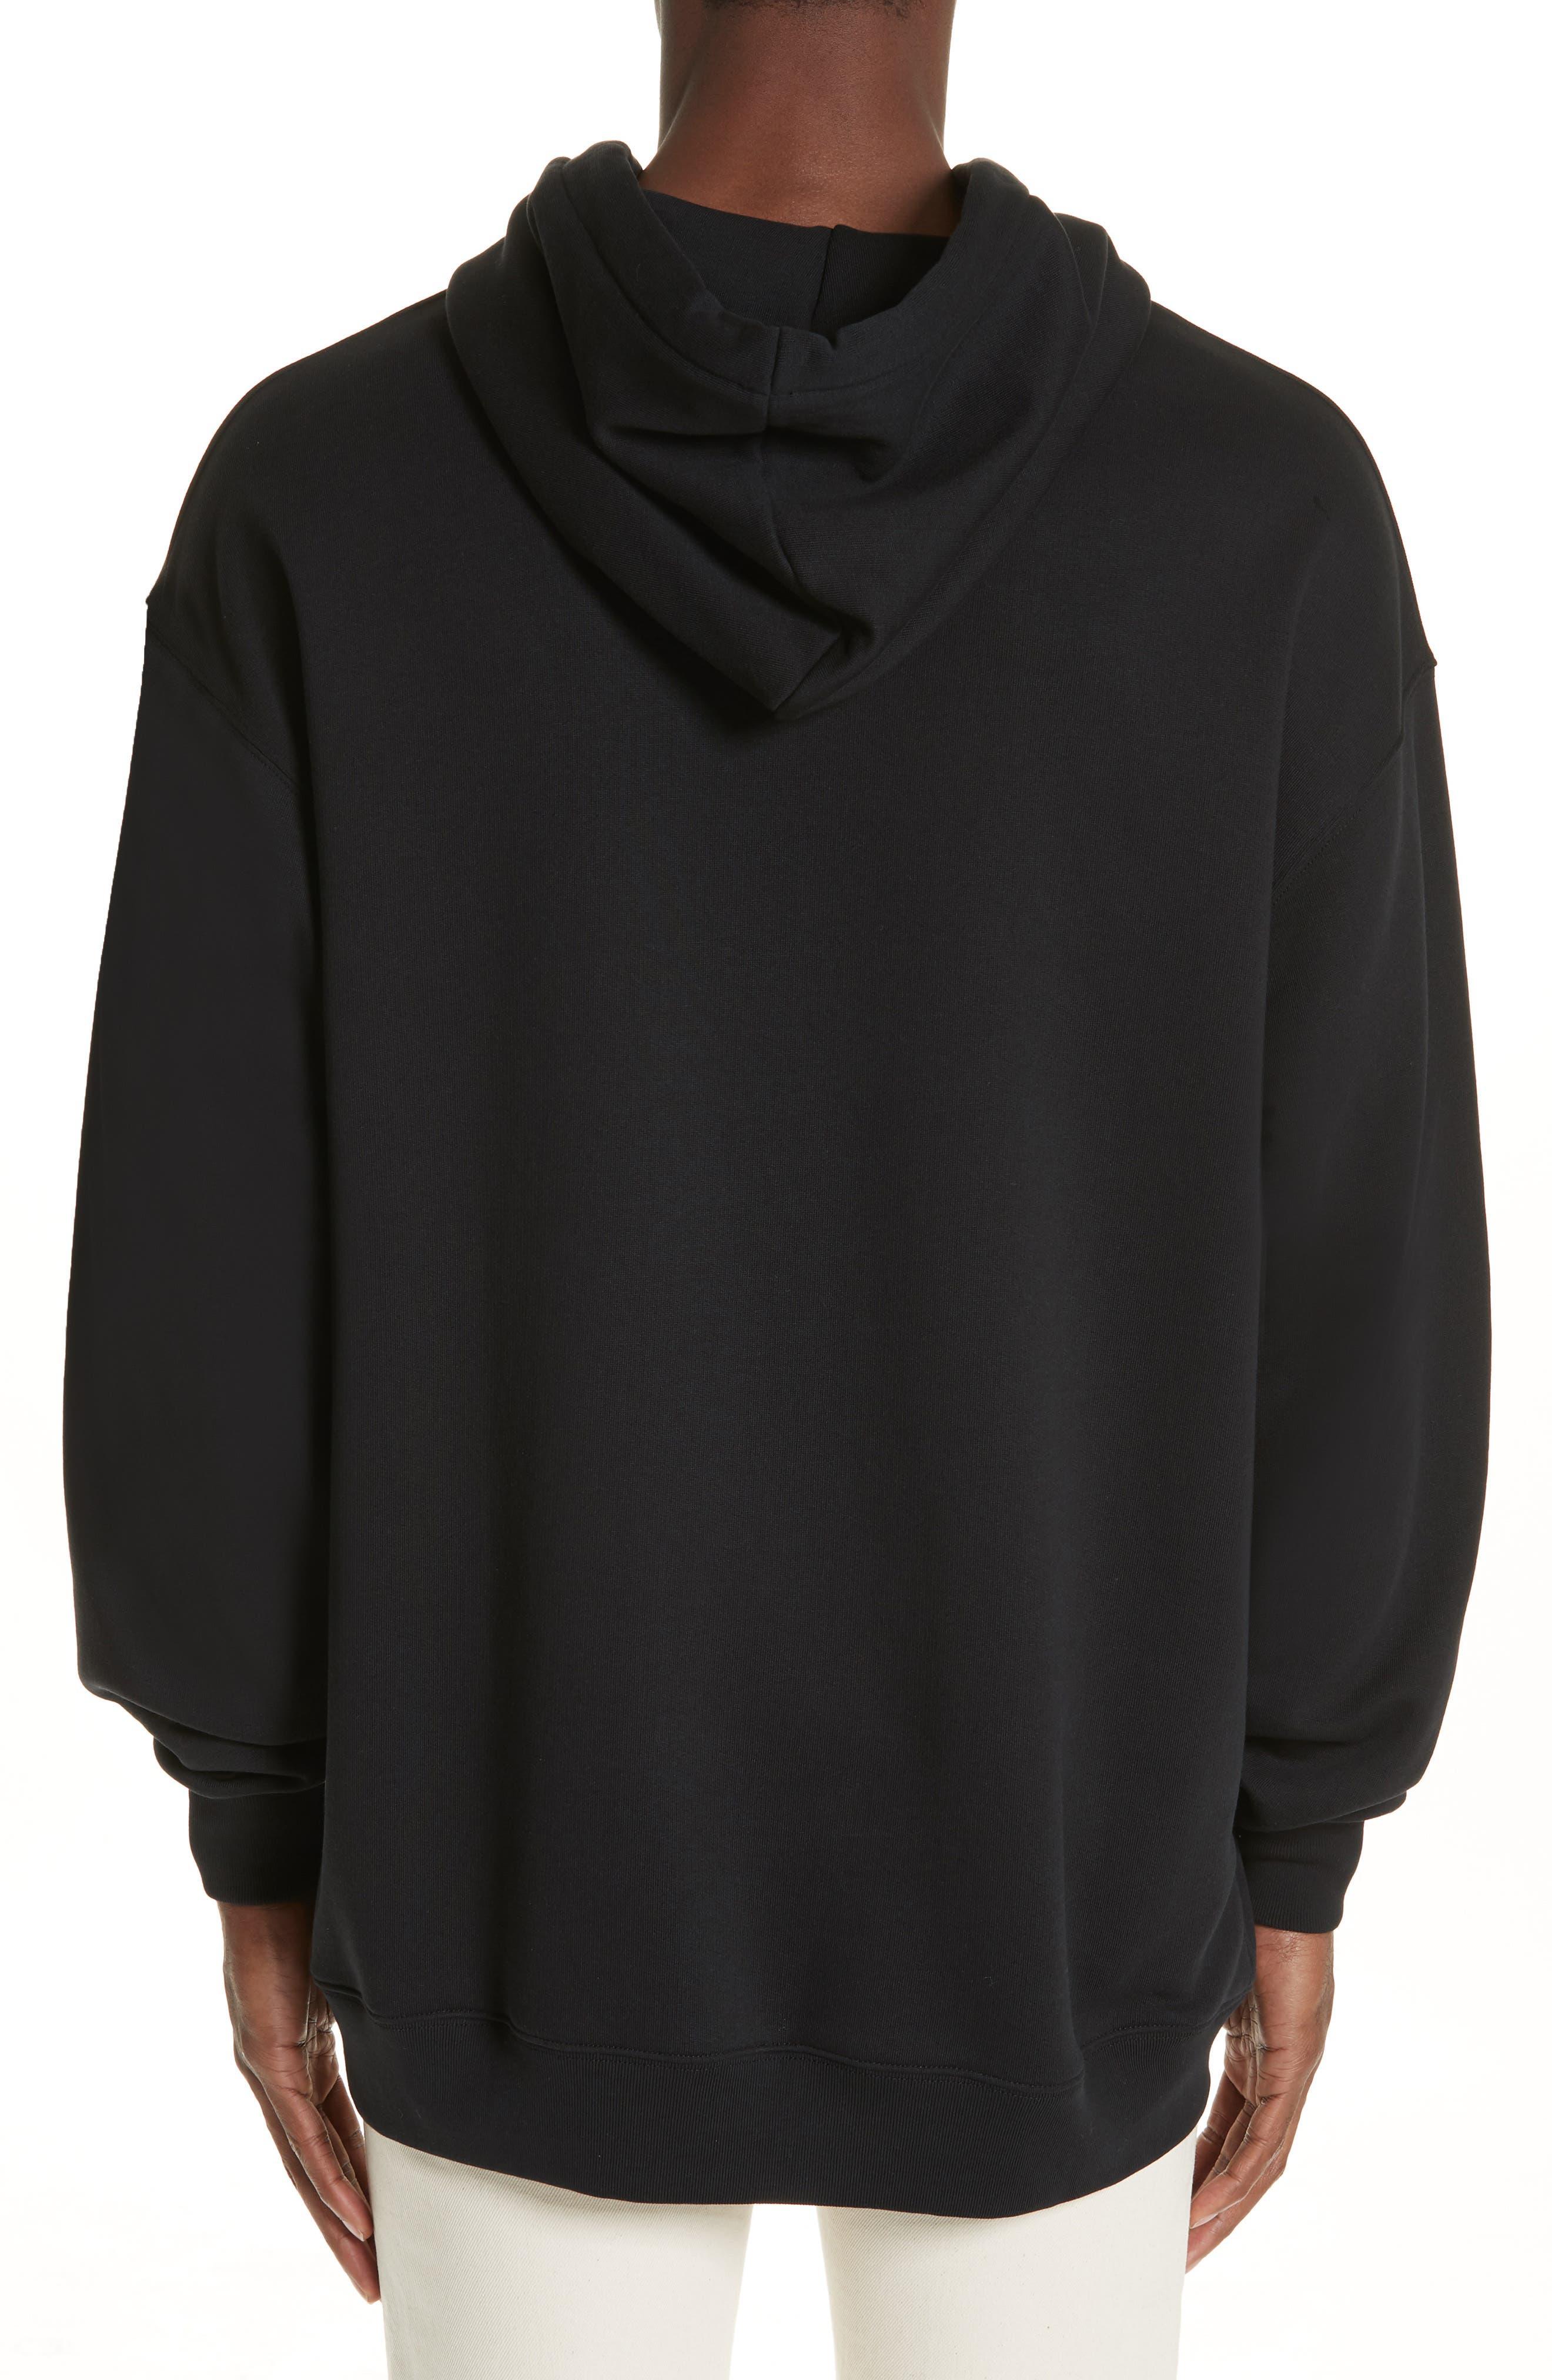 ACNE STUDIOS, Farrin Face Hooded Sweatshirt, Alternate thumbnail 2, color, BLACK